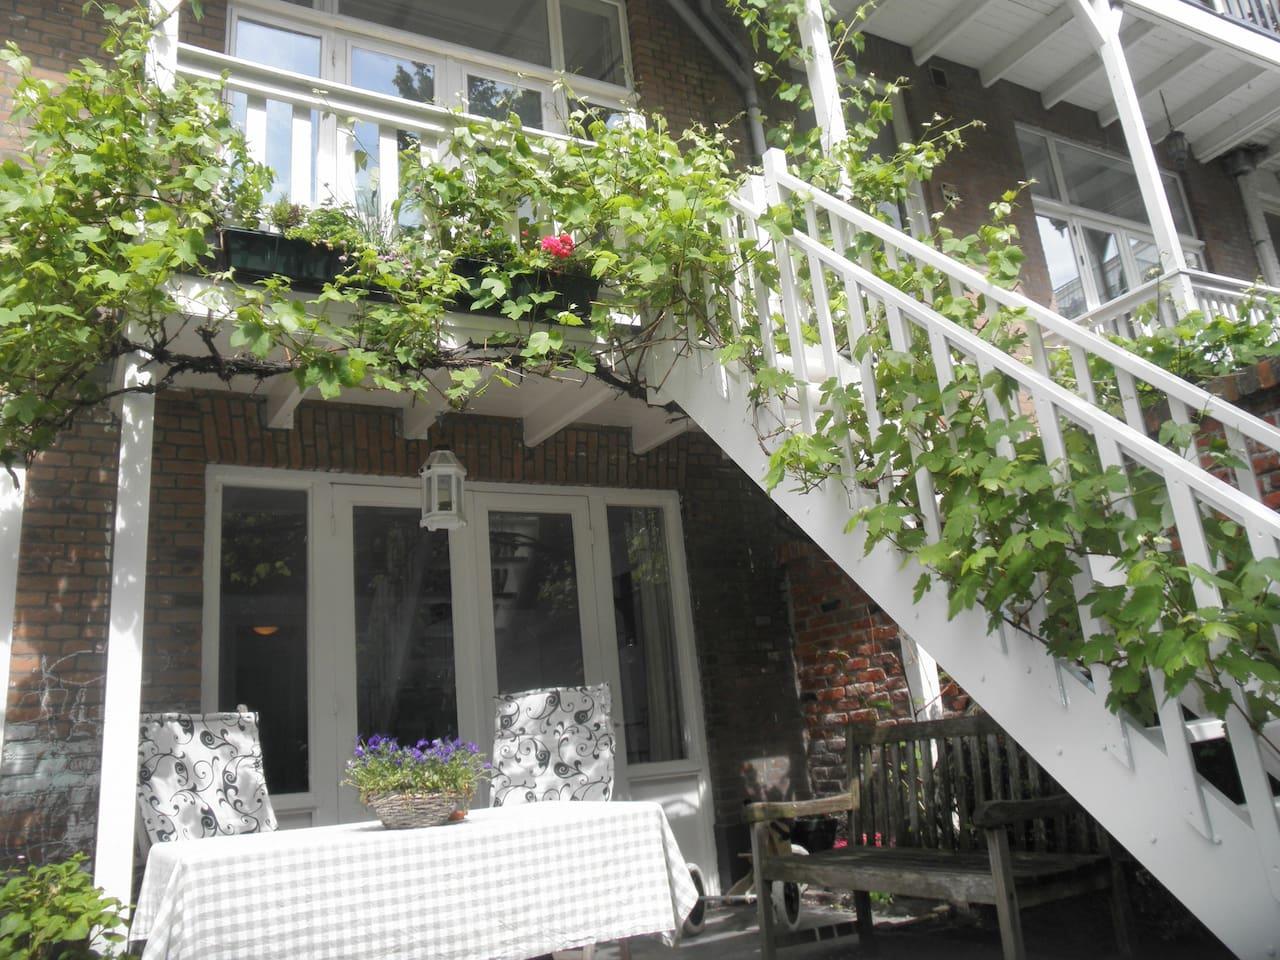 Veranda en trap naar achtertuin